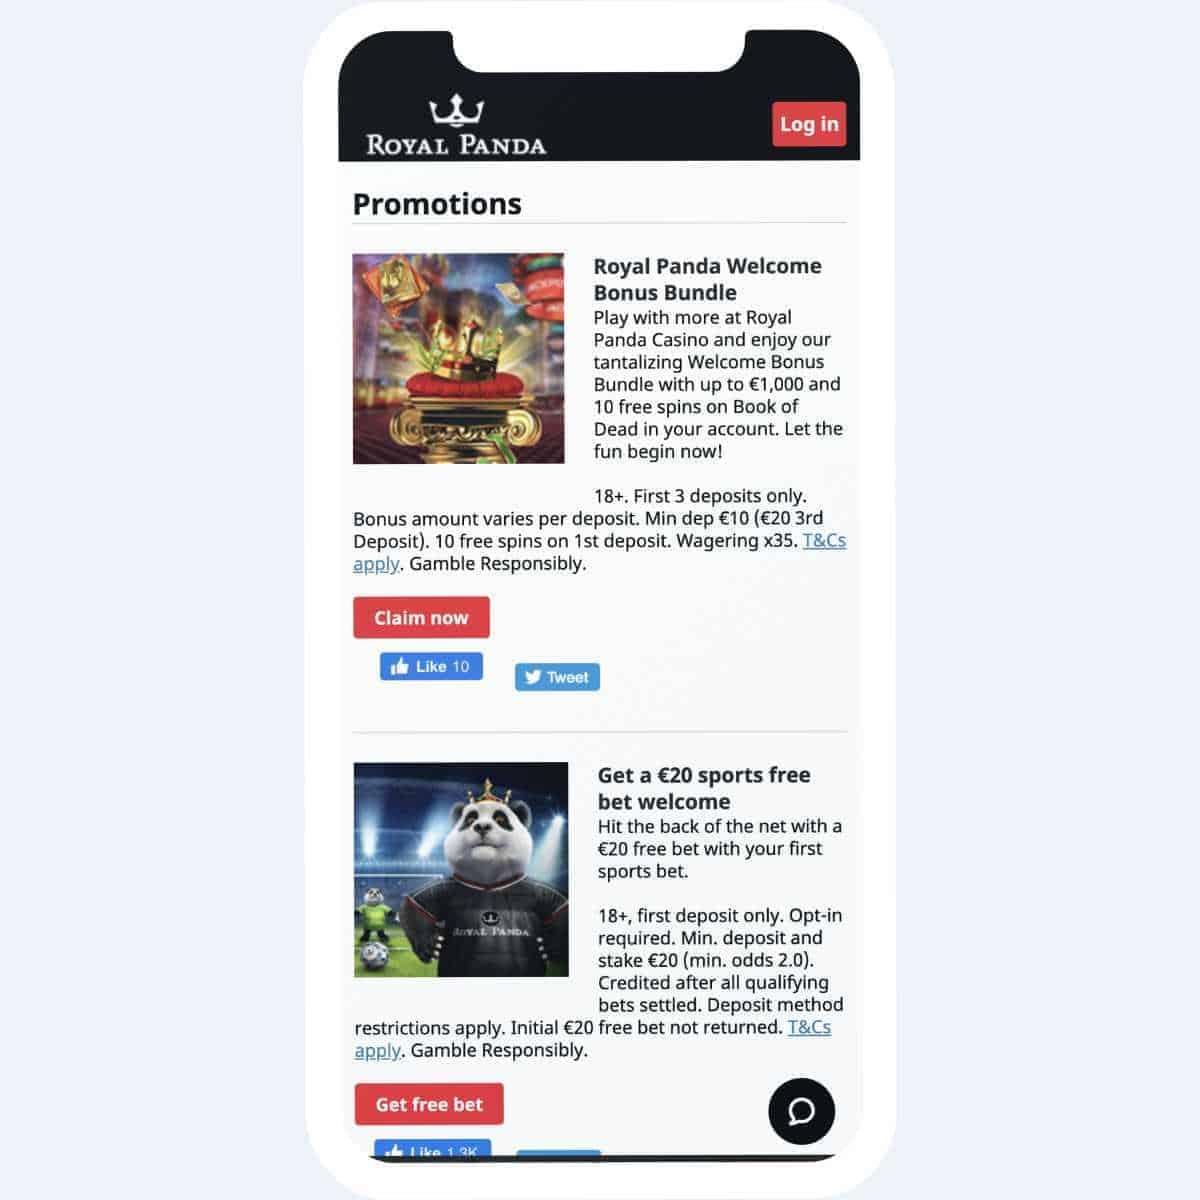 royal panda promotions mobile